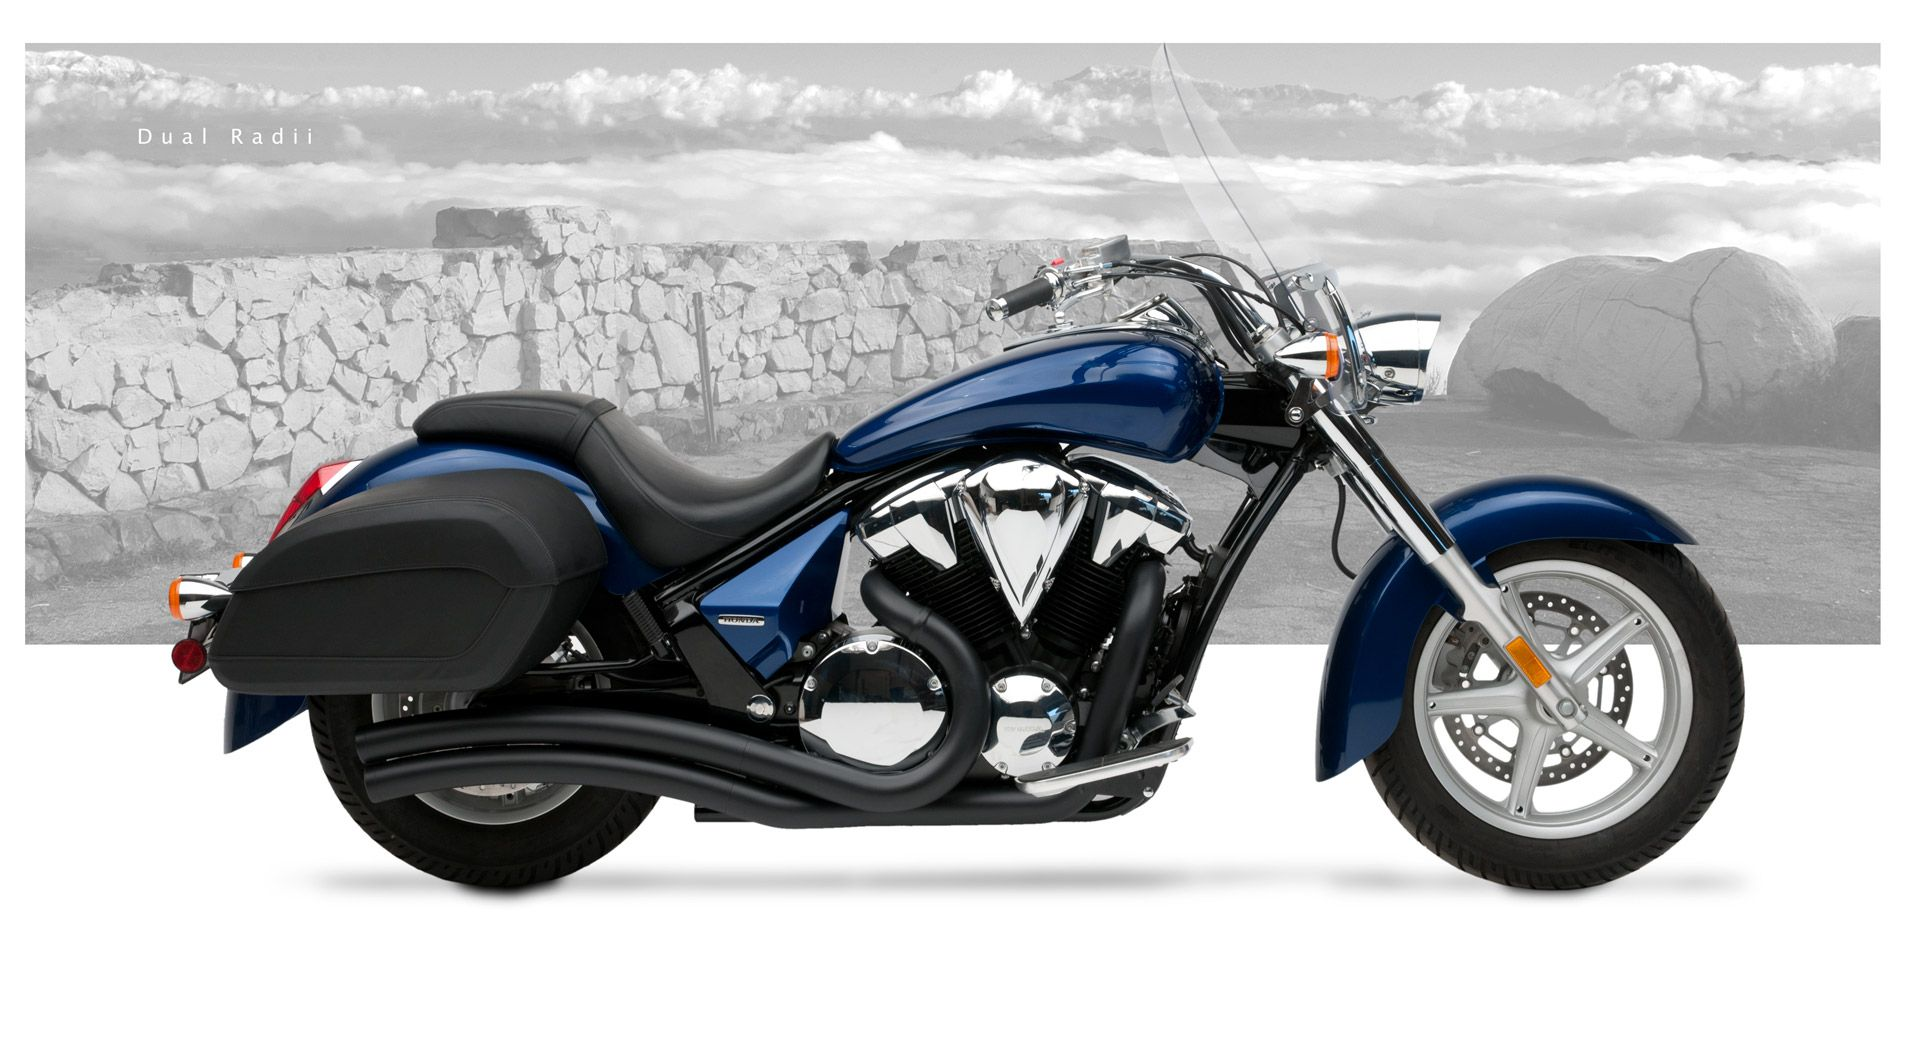 honda interstate custom - google search | things i want